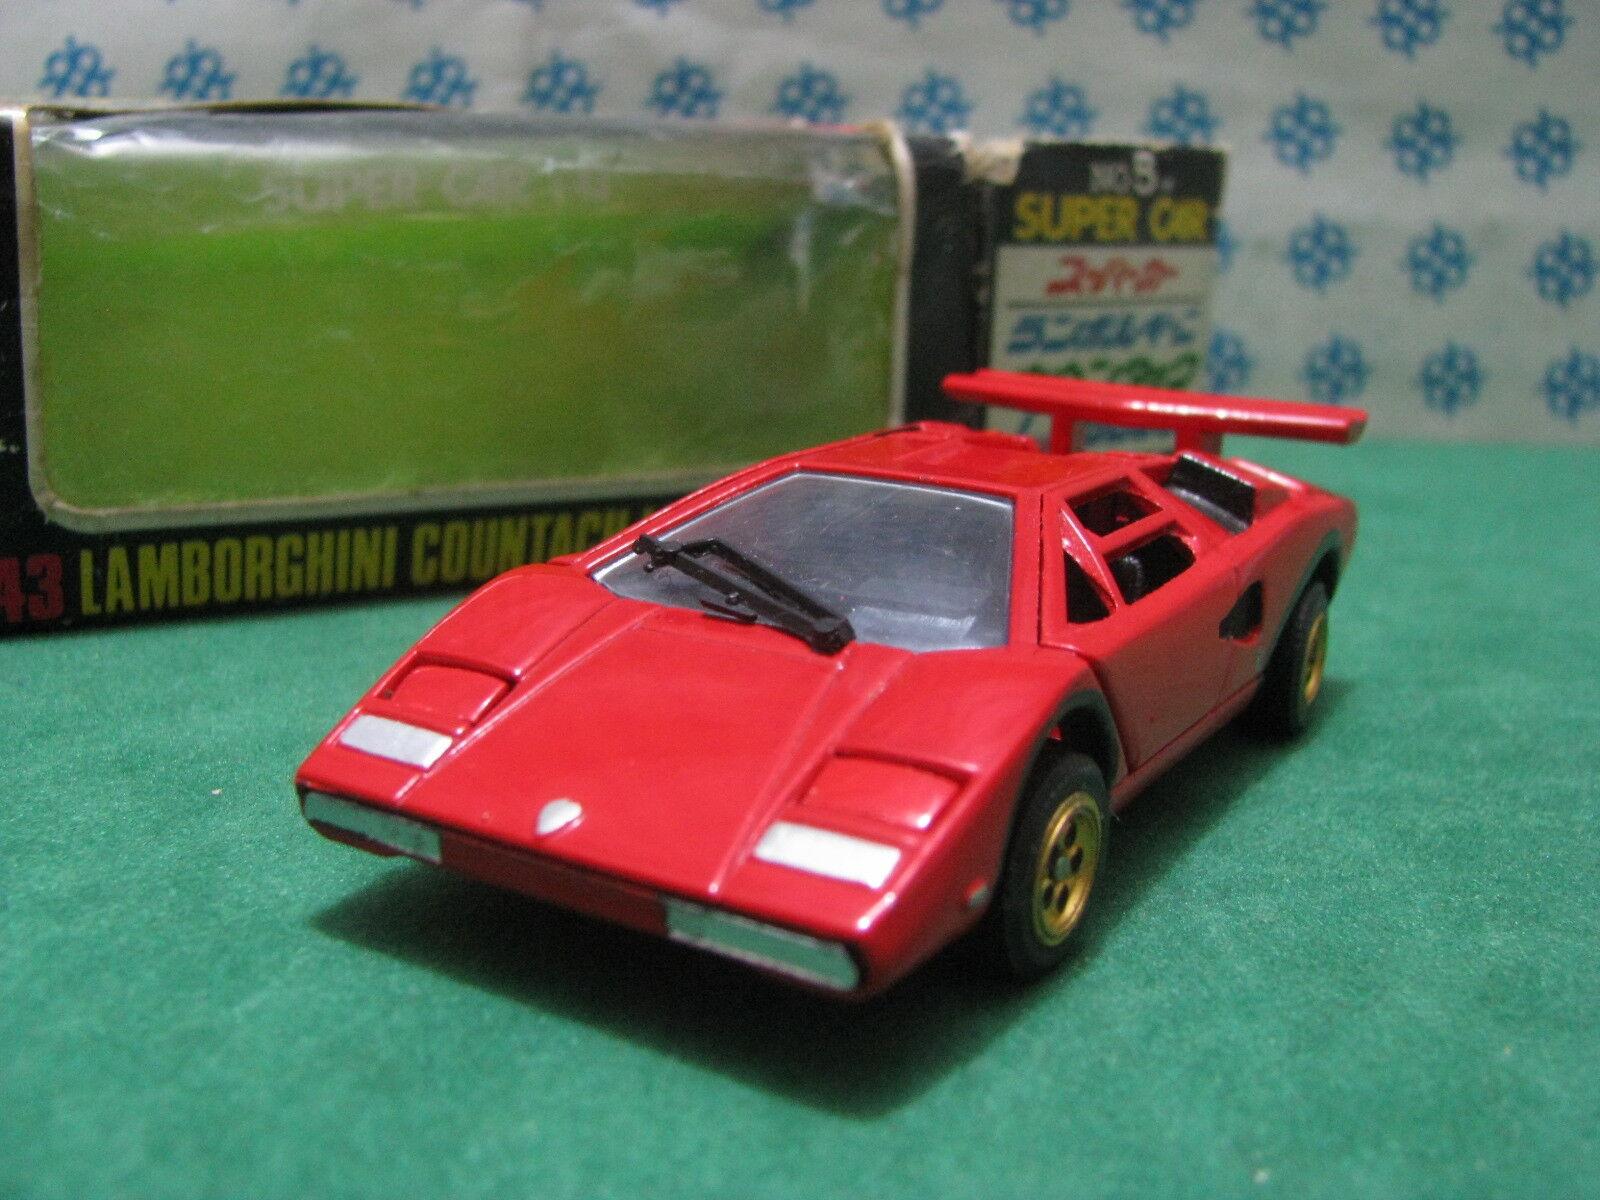 Rara vintage-Lamborghini Countach LP 500 - 1 43 Taito-ku nº 05 Supercar